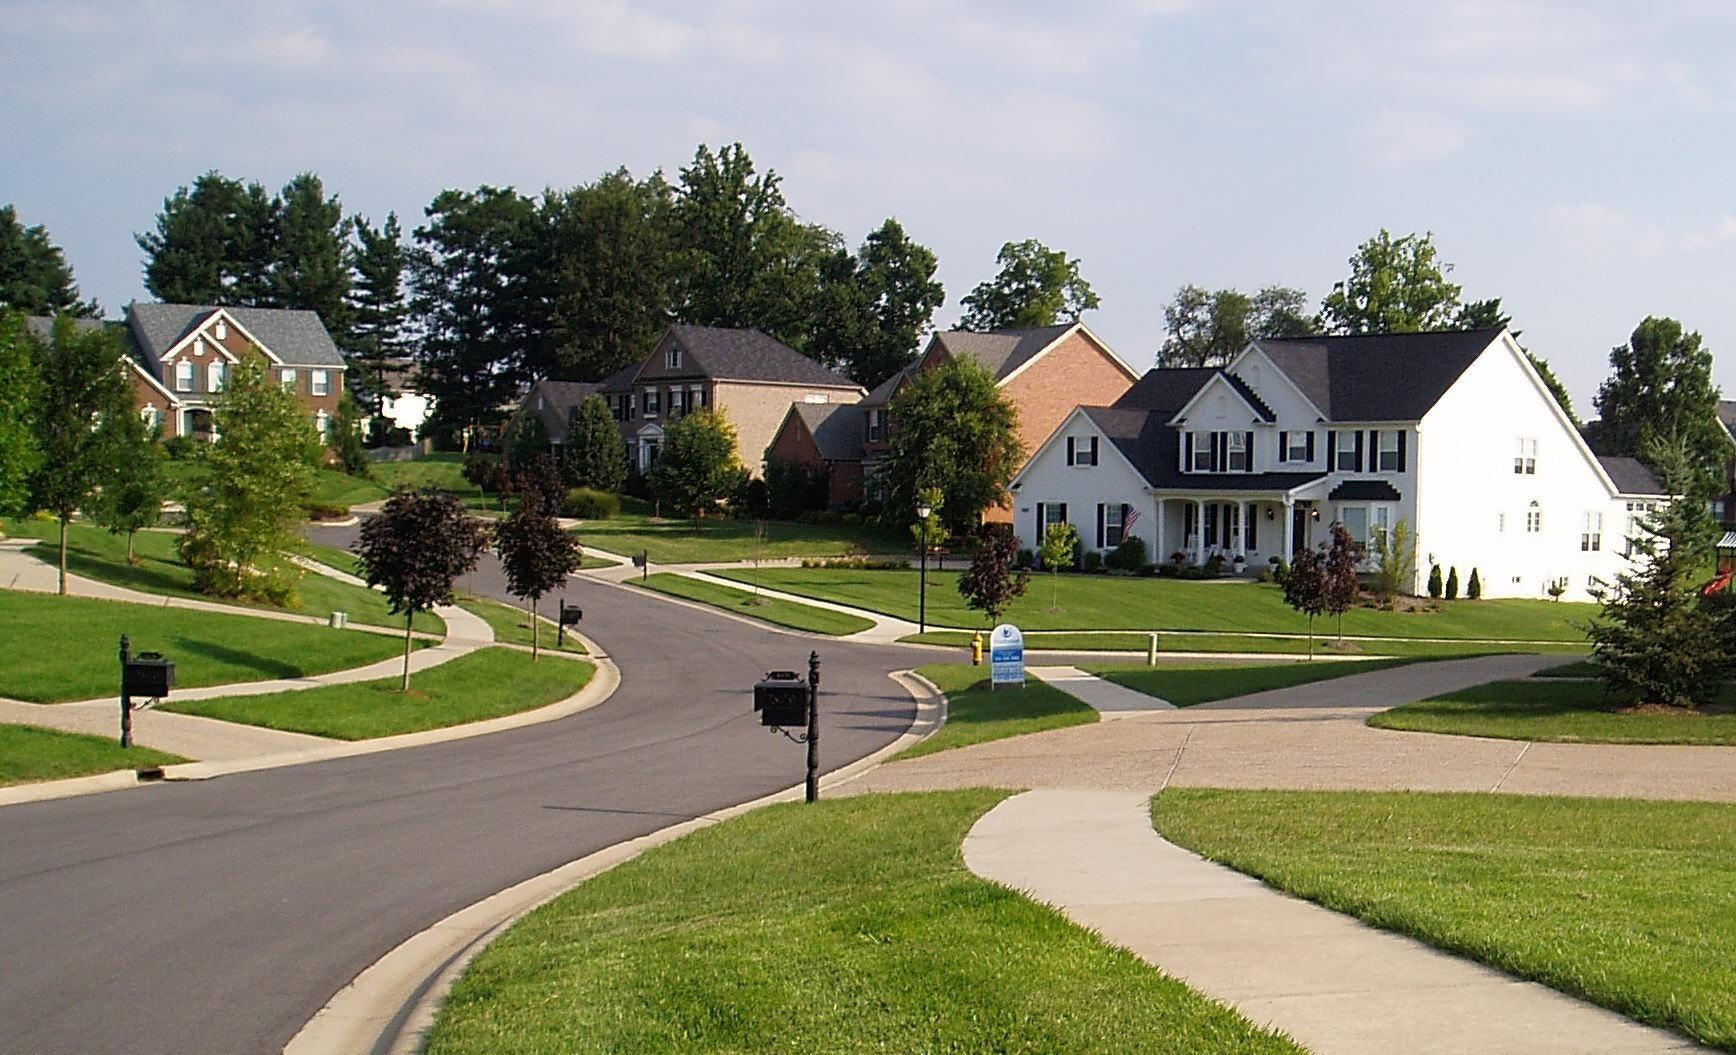 We live in a suburban neighborhood neighbors are all